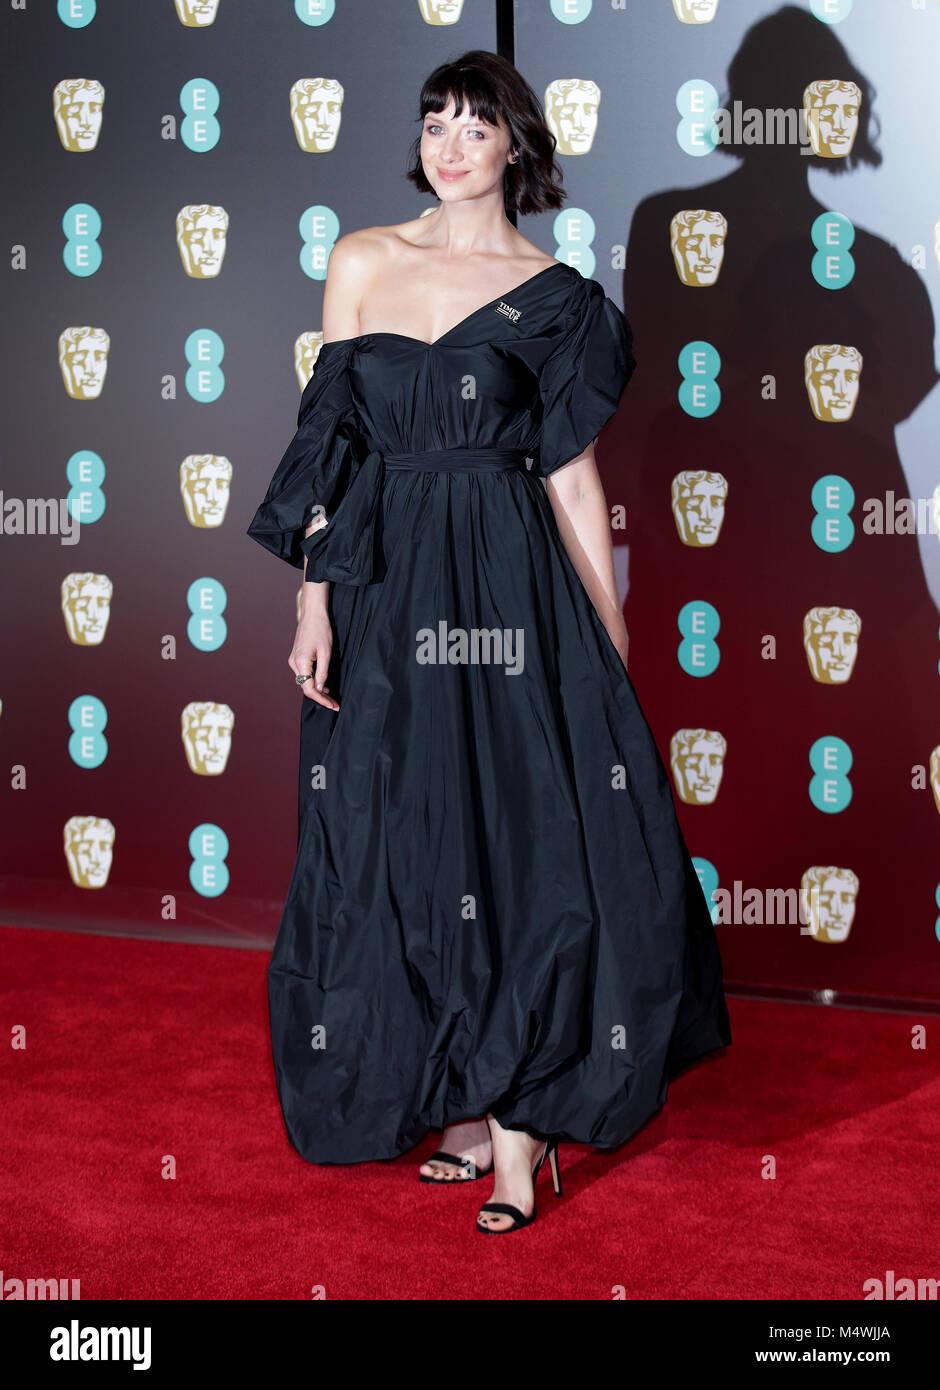 Caitriona Balfe attending the EE British Academy Film Awards